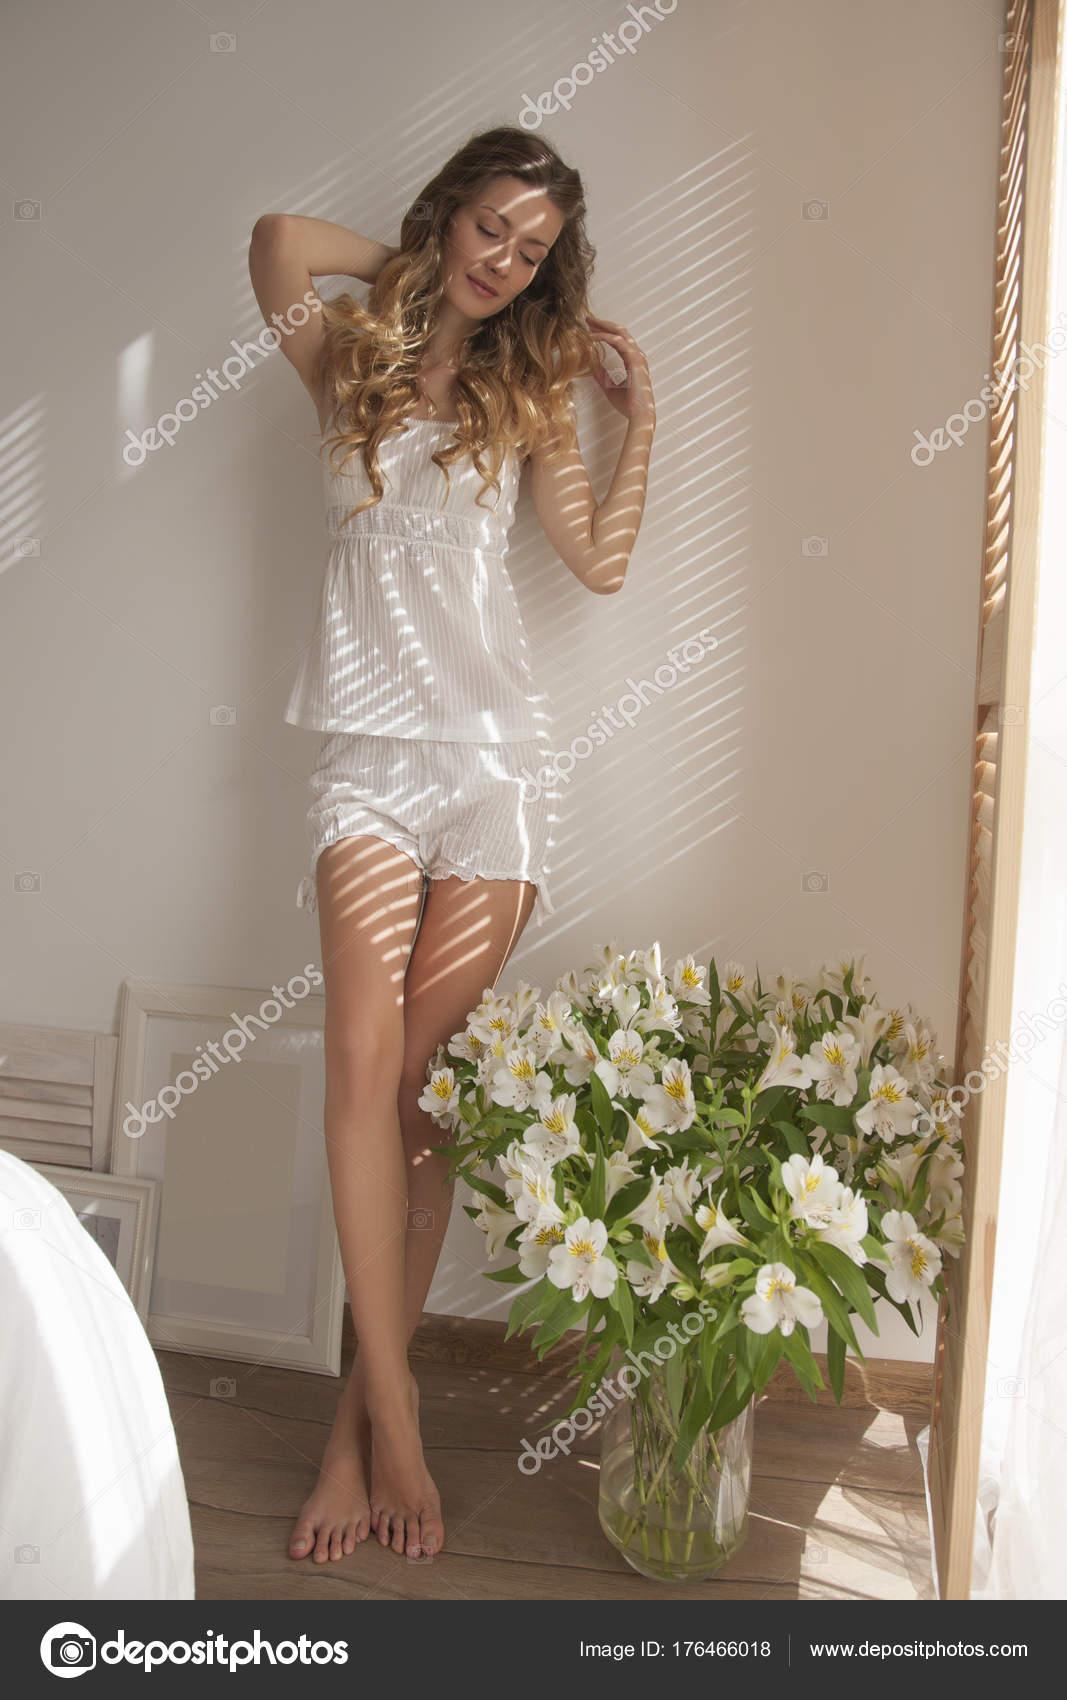 faab87af2311 Sun Shining Bedroom Closeup Beauty Woman White Pajamas Coffee Cup — Stock  Photo